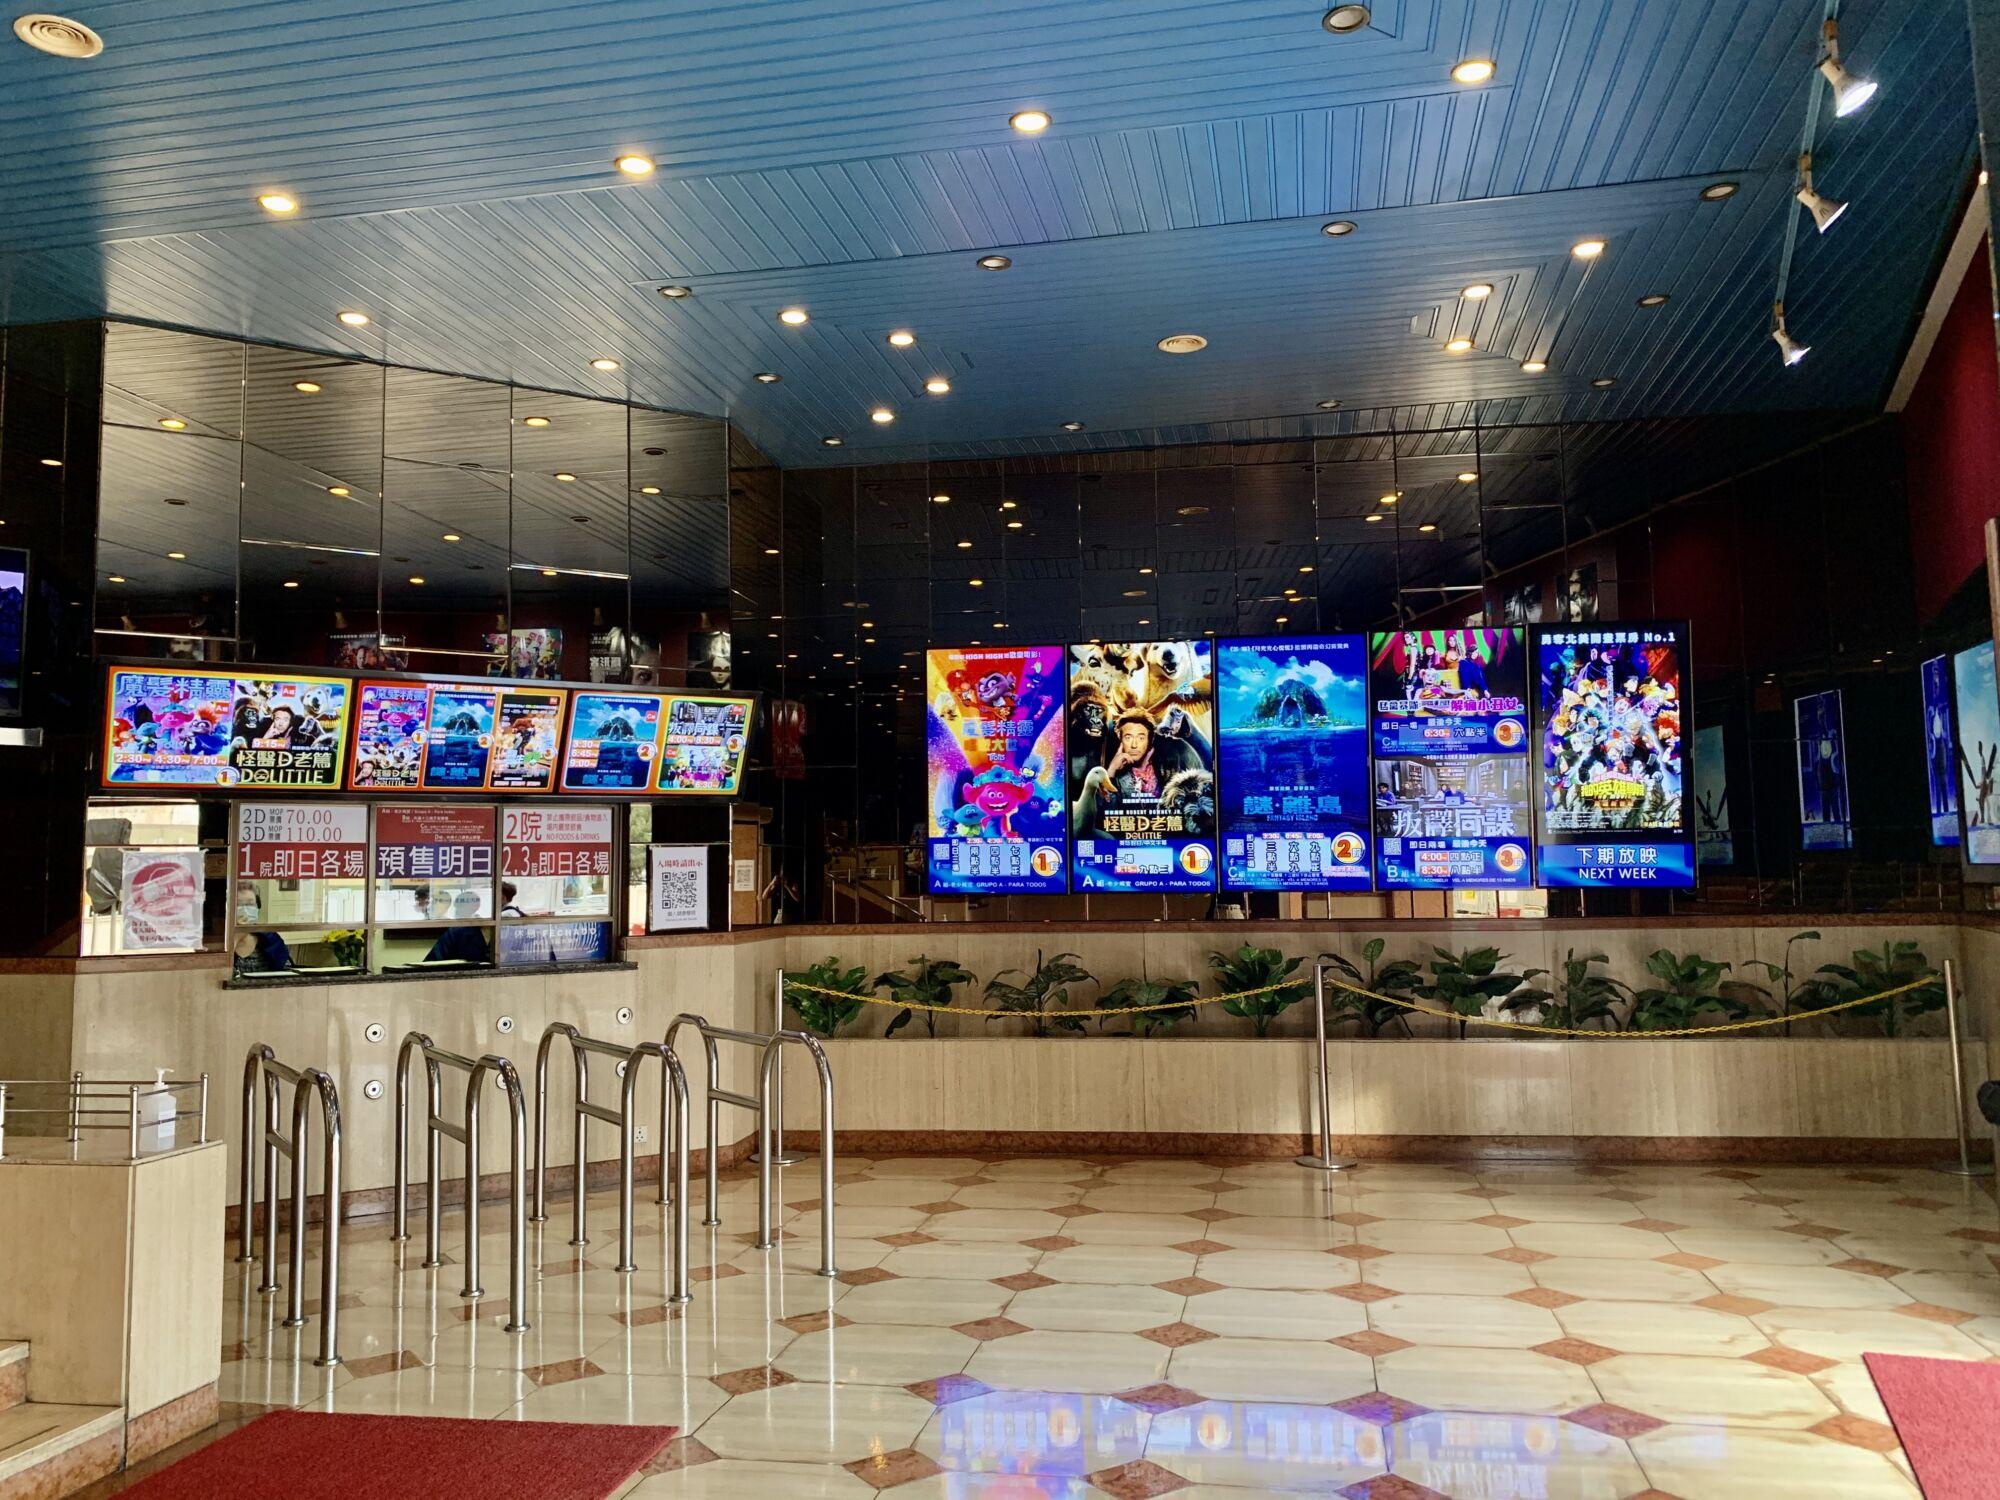 Cineteatro Ticket Area Macau Lifestyle